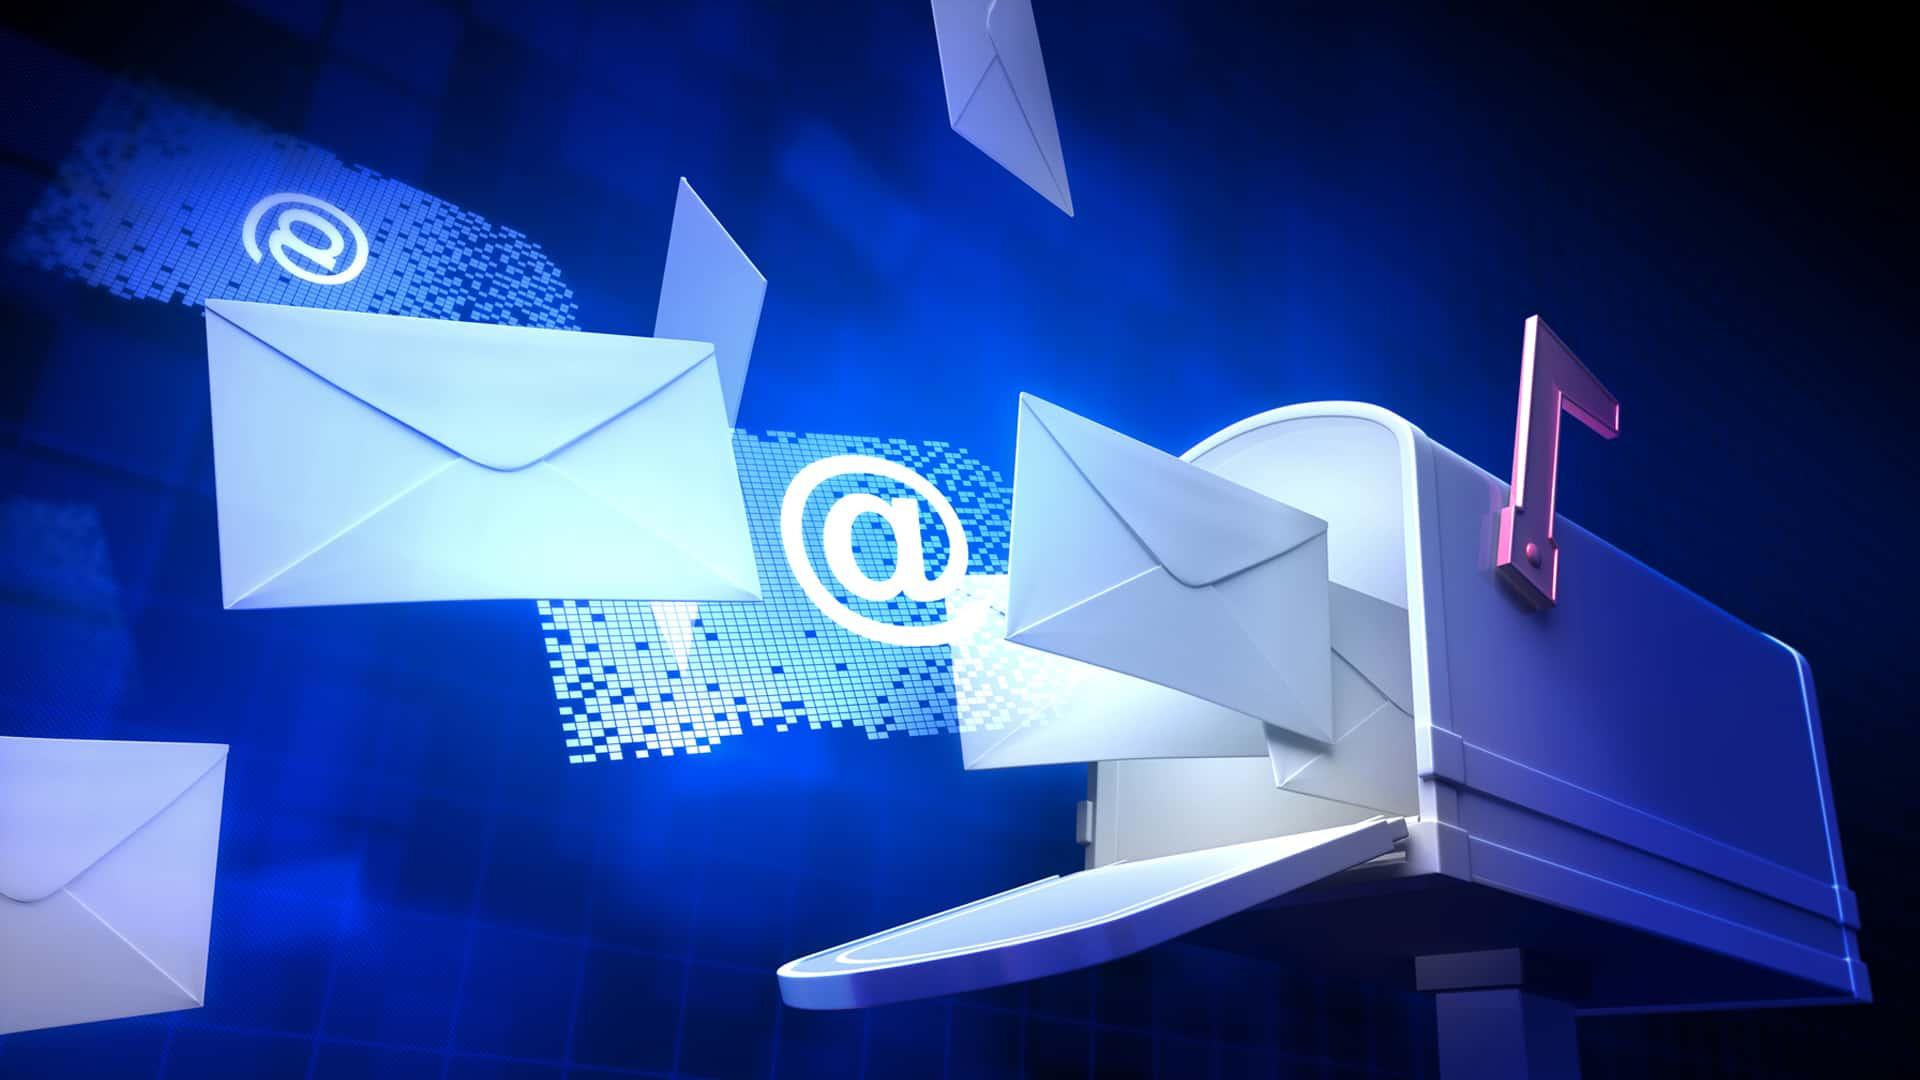 BG email marketing Restaurant & Hospitality BG email marketing